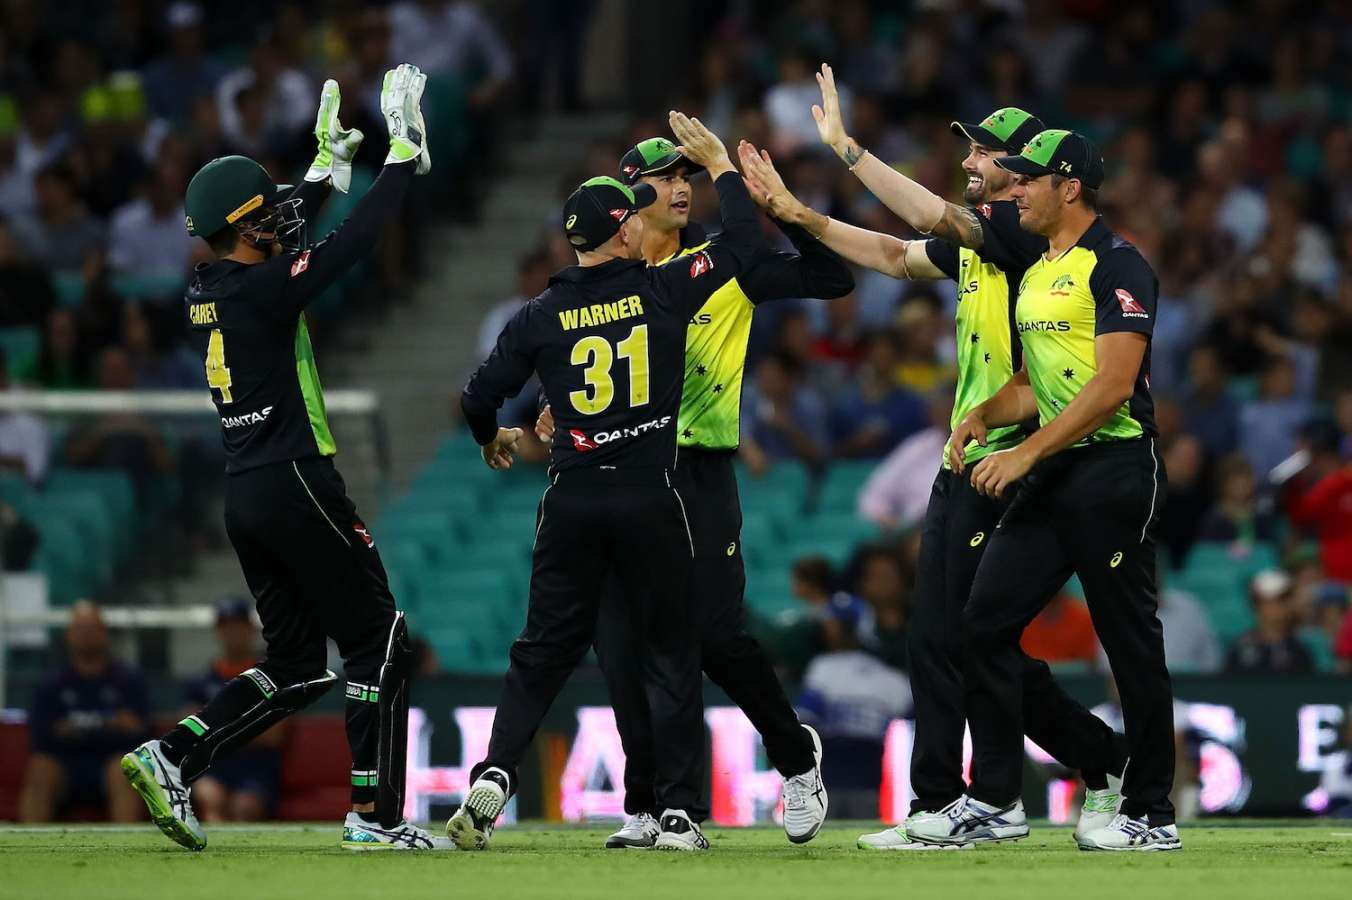 tri series cricket games free